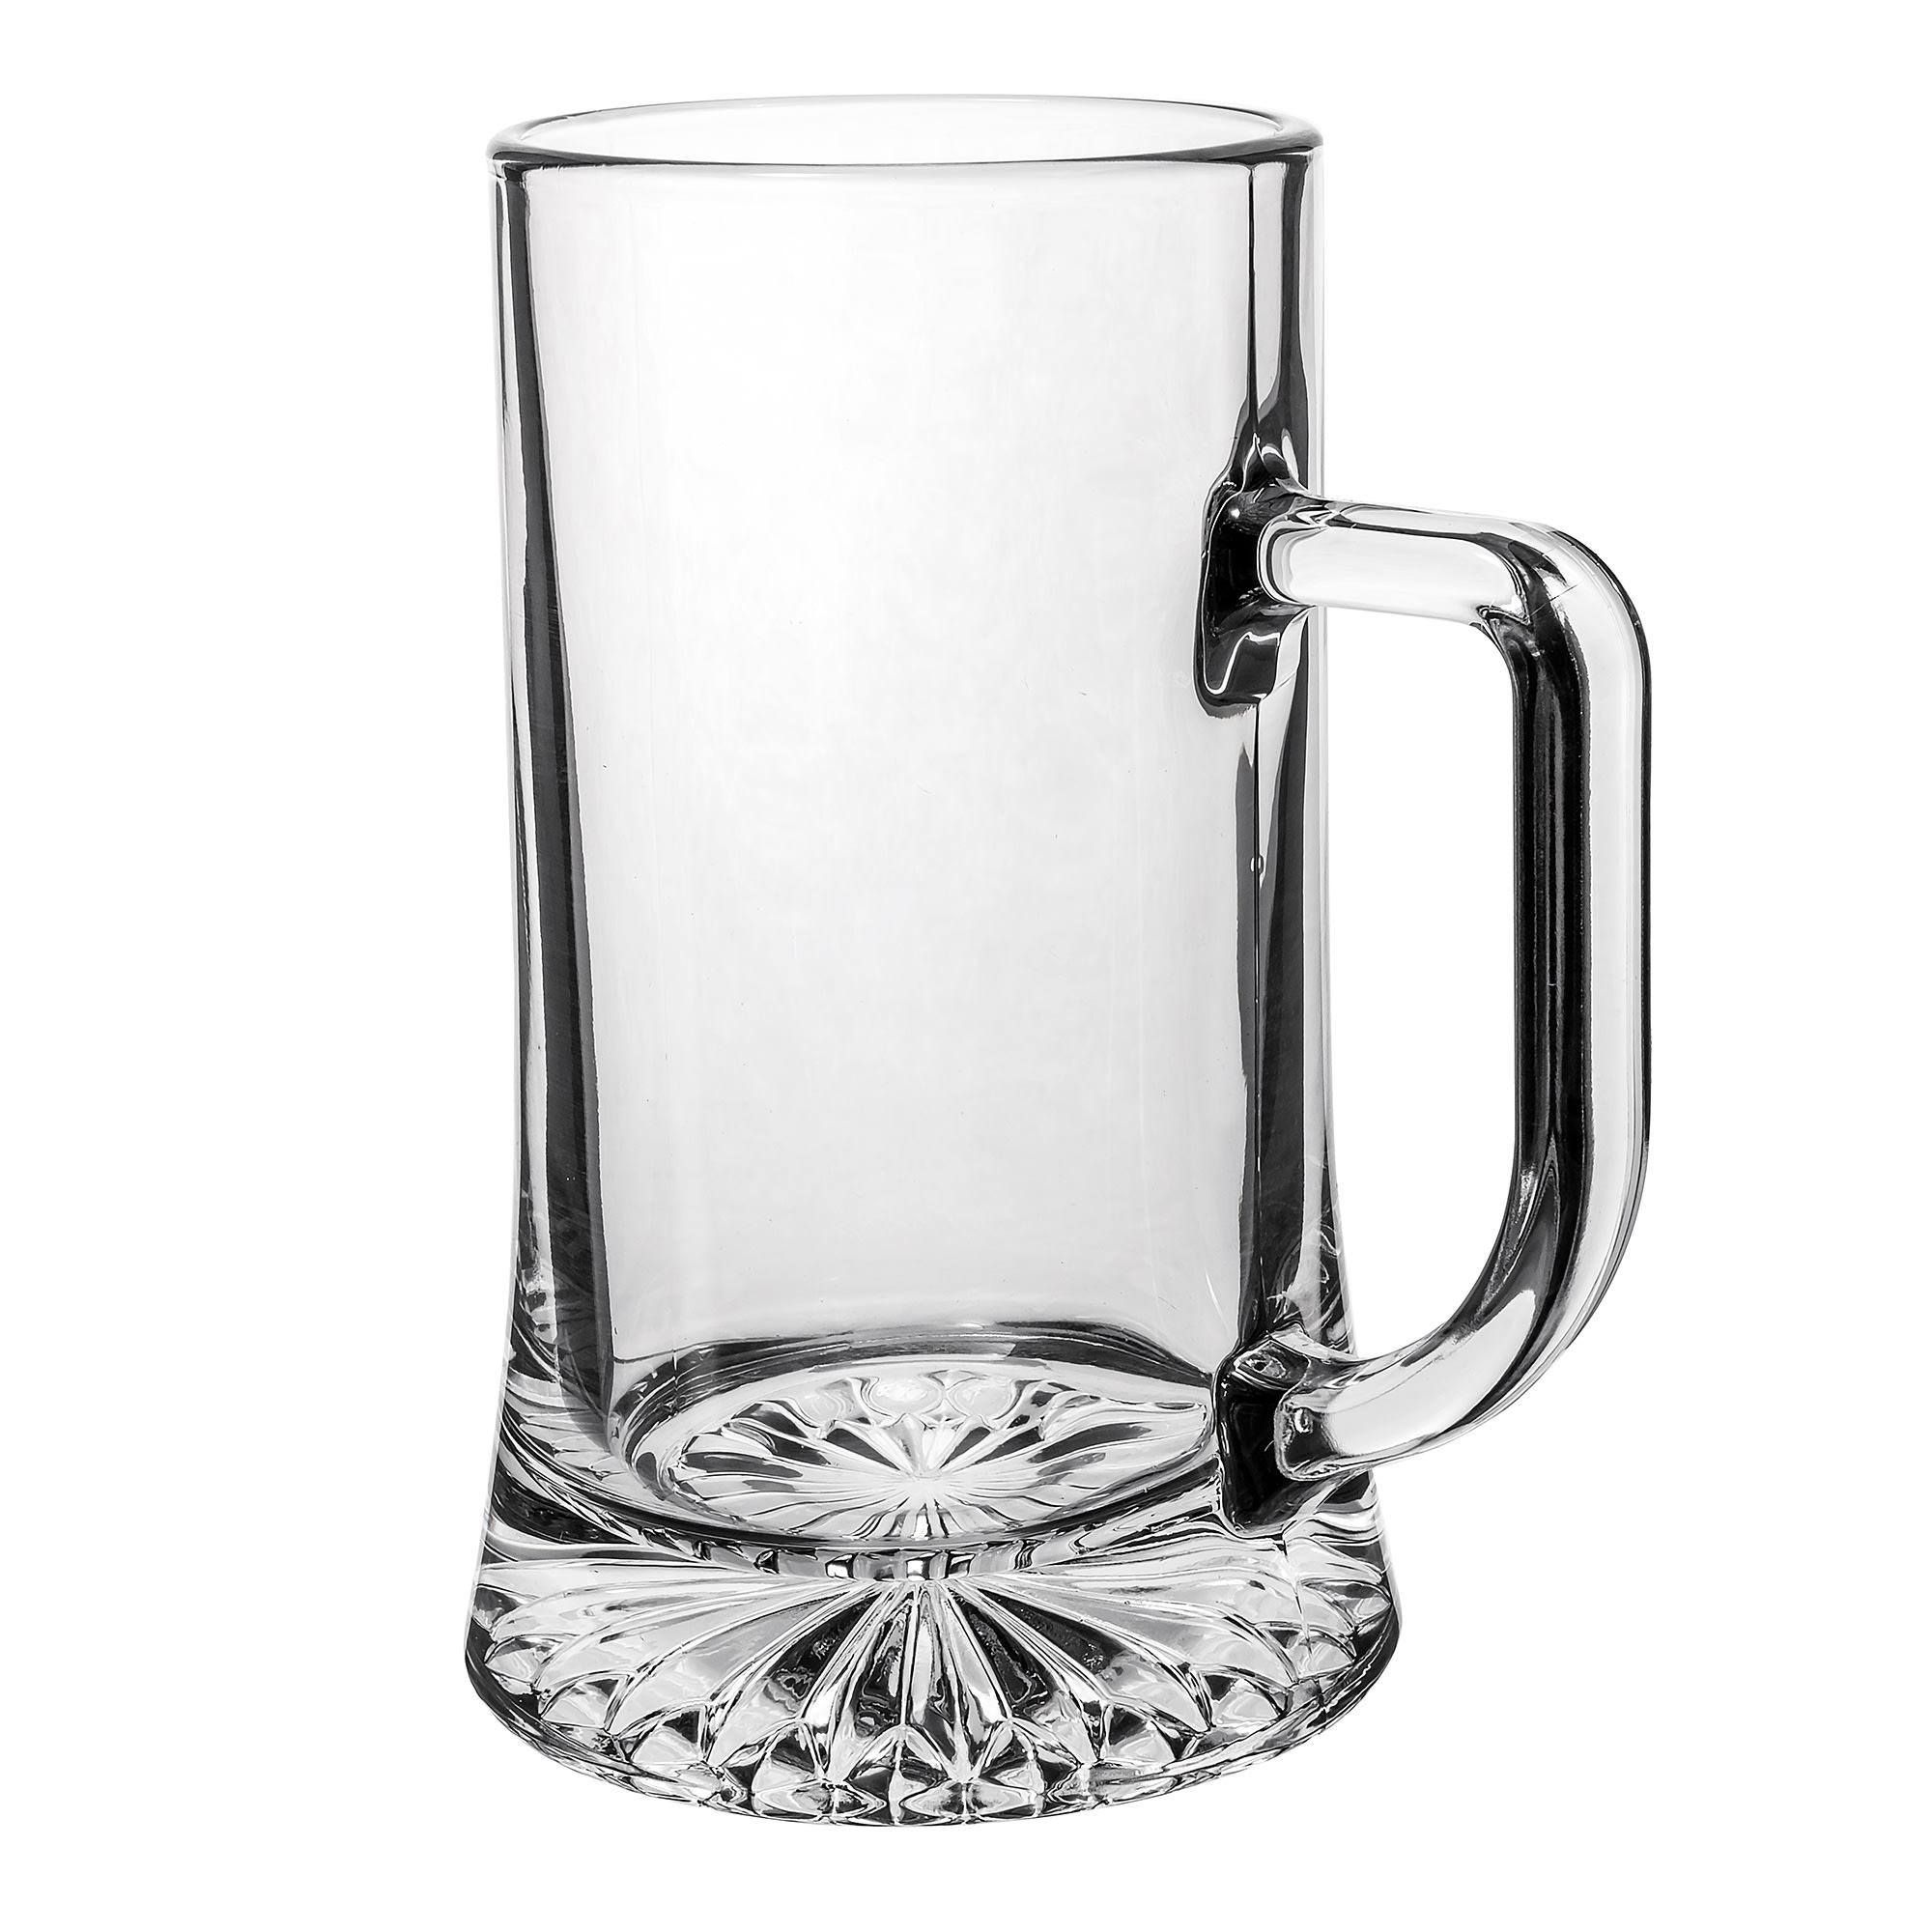 Libbey 2329SA450 17.5 oz Maxim Mug